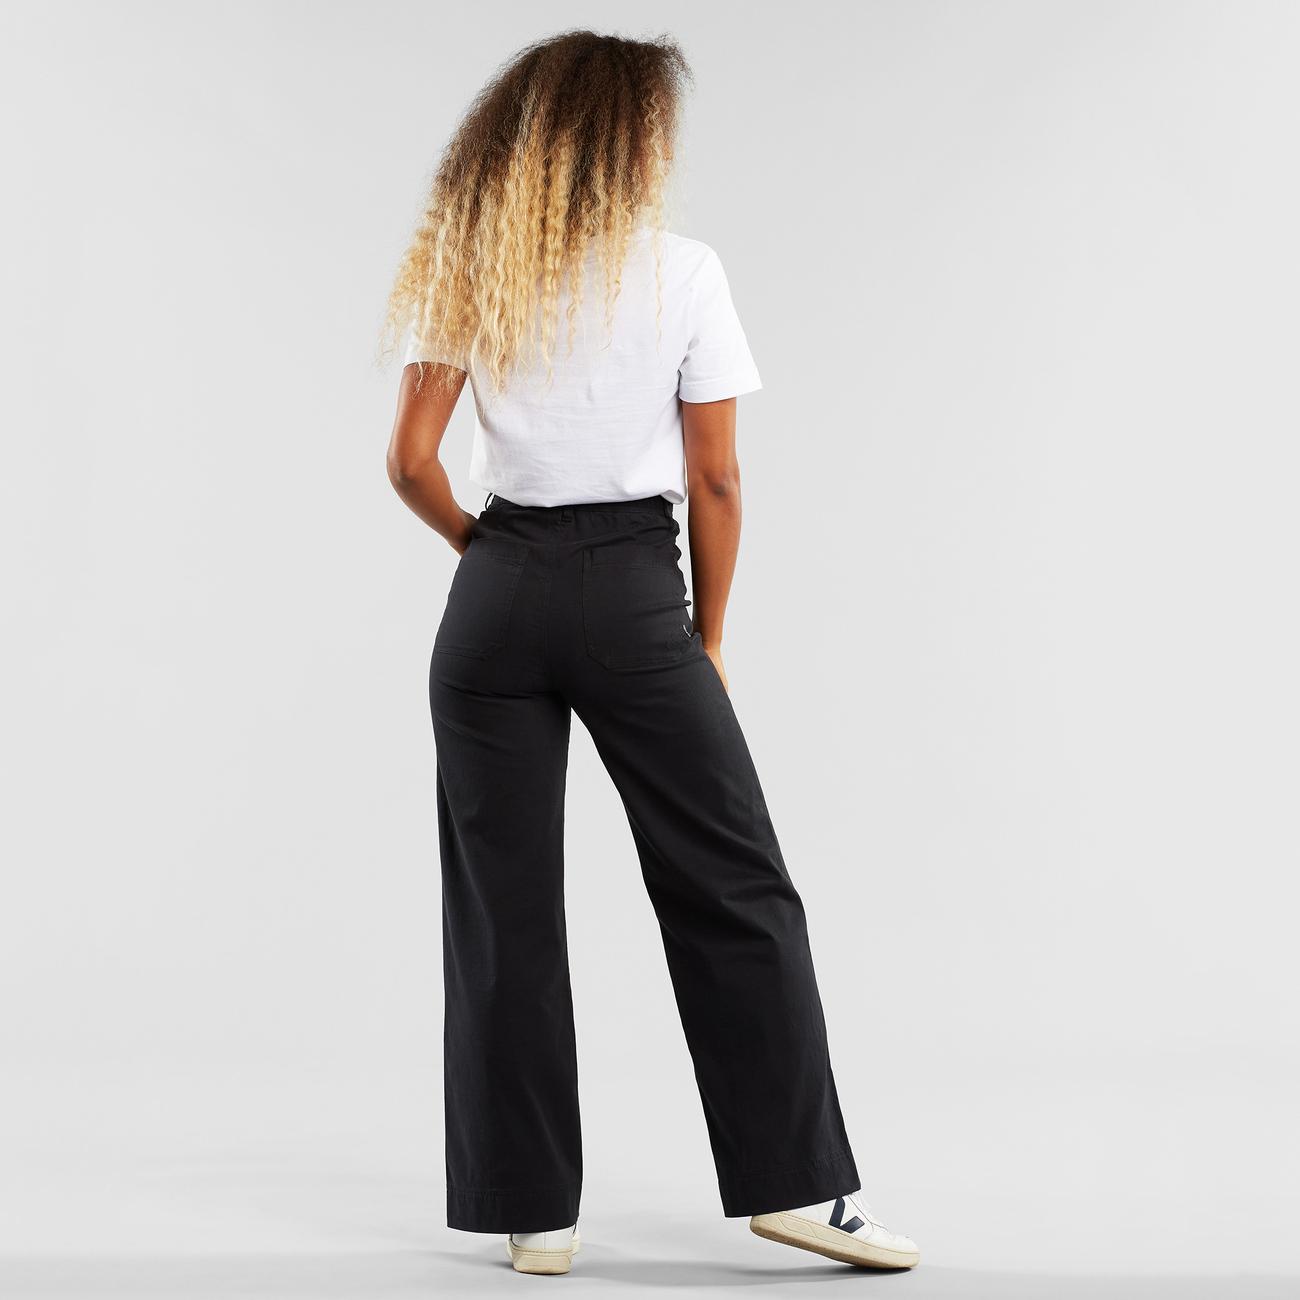 Pants Vara Workwear Black